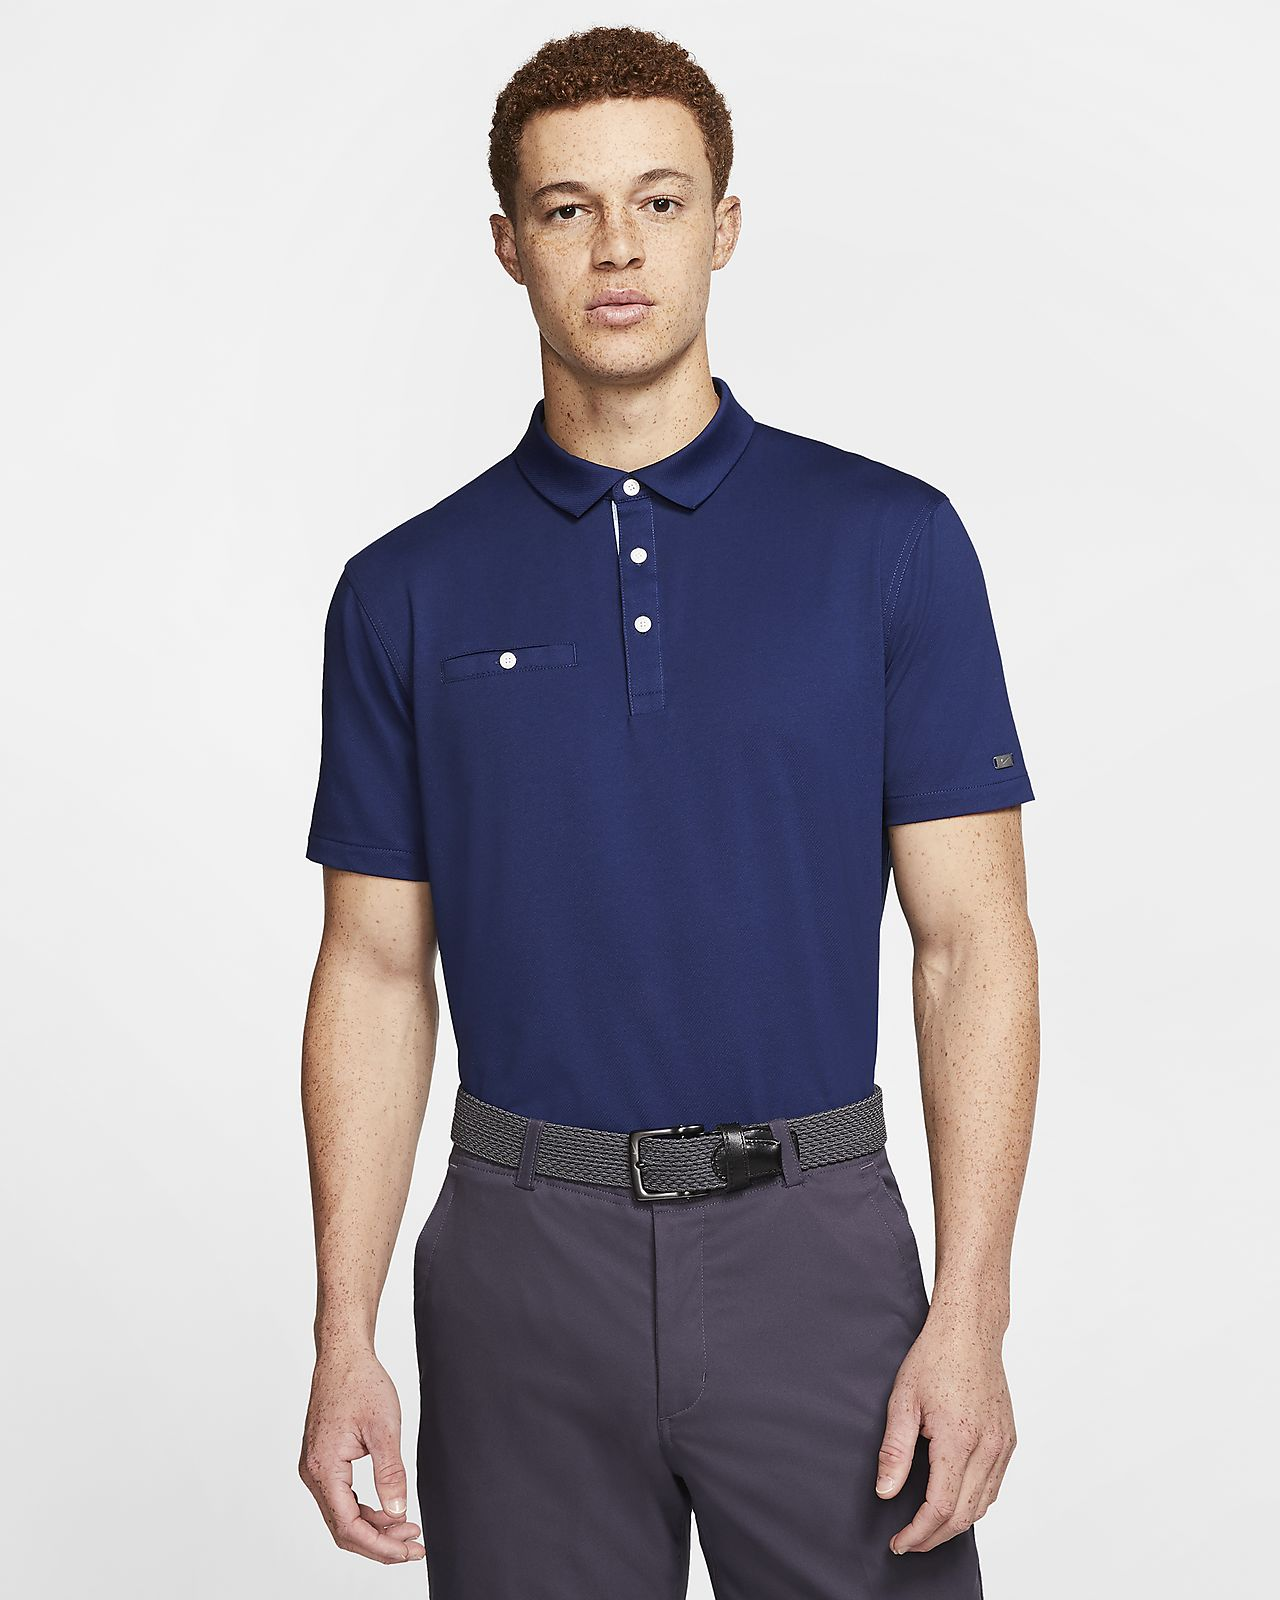 Polo de golf para hombre Nike Dri-FIT Player